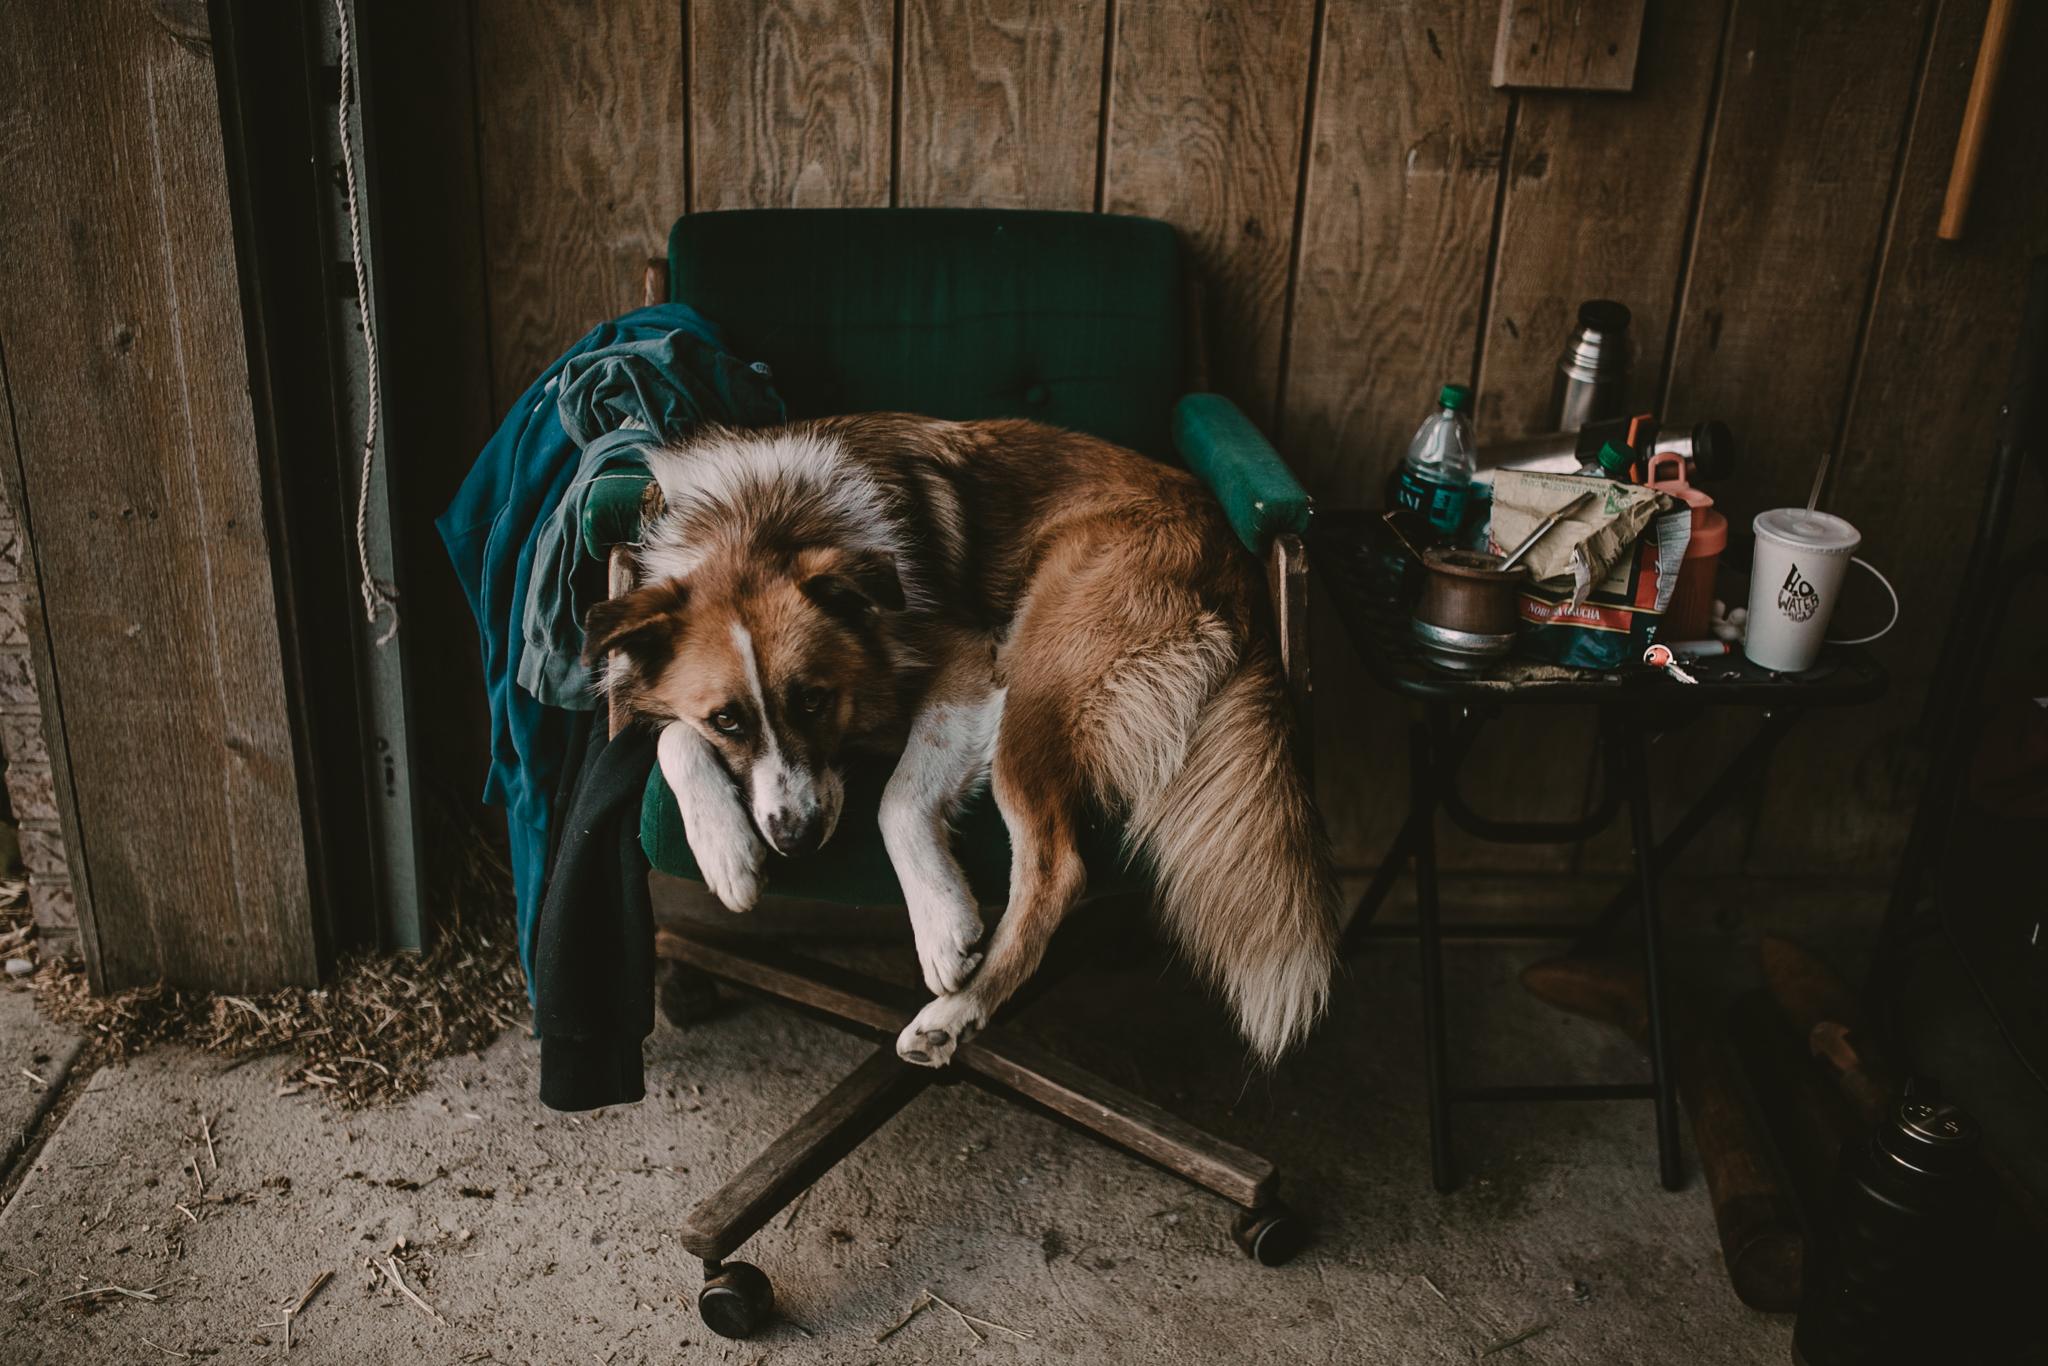 chicago-polo-pet-photographer-leah-lewis-dog-farm-arranmore